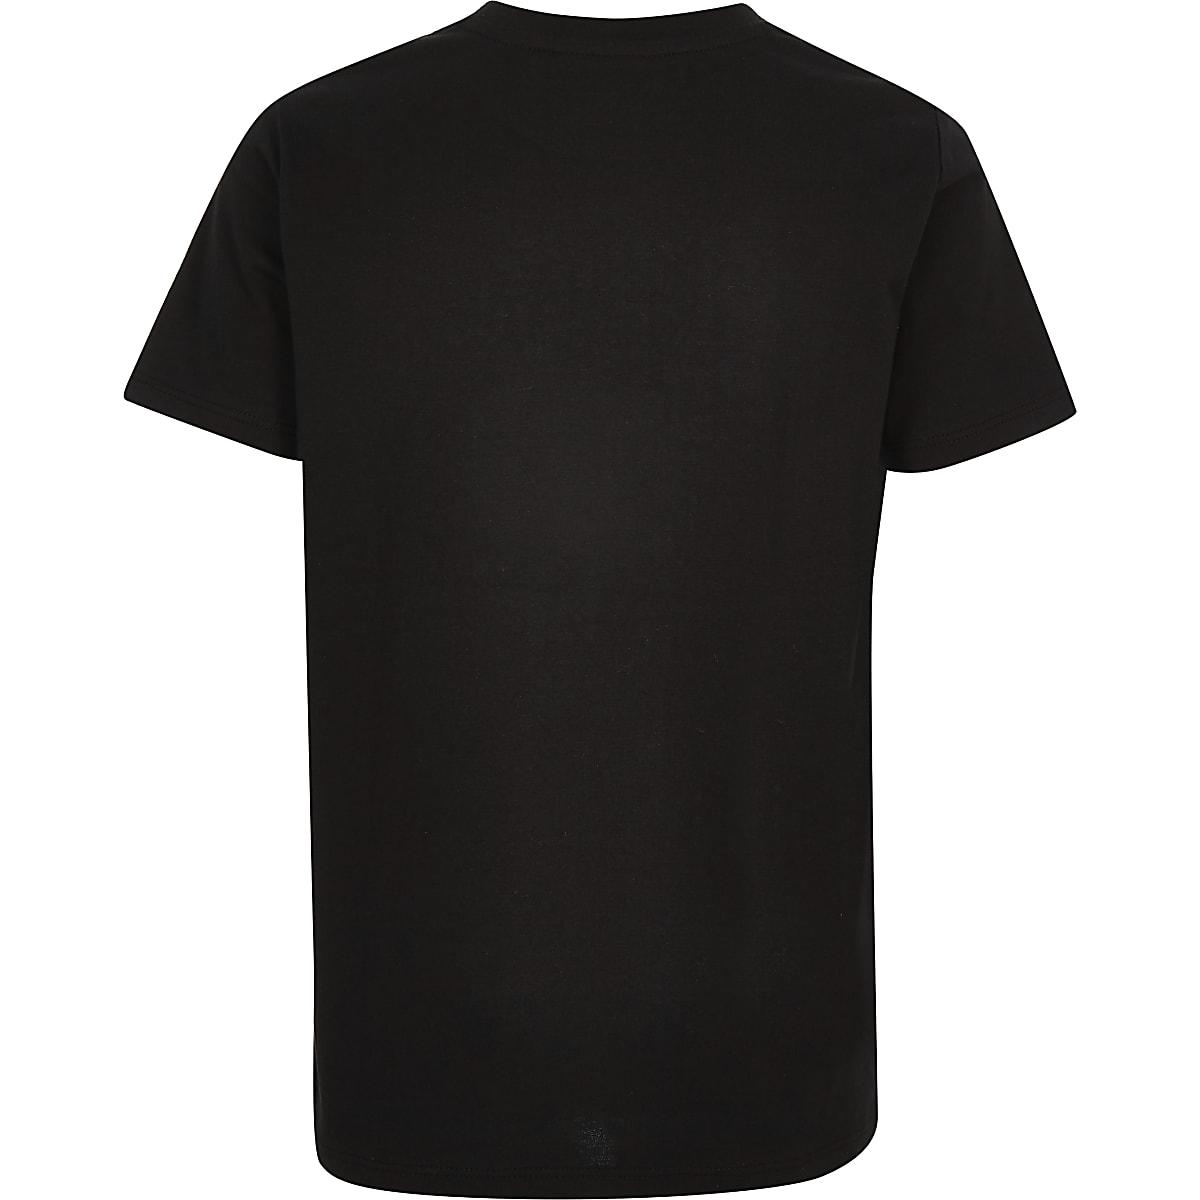 b1e23683 Boys black stud embellished Pokemon T-shirt - T-shirts - T-Shirts ...